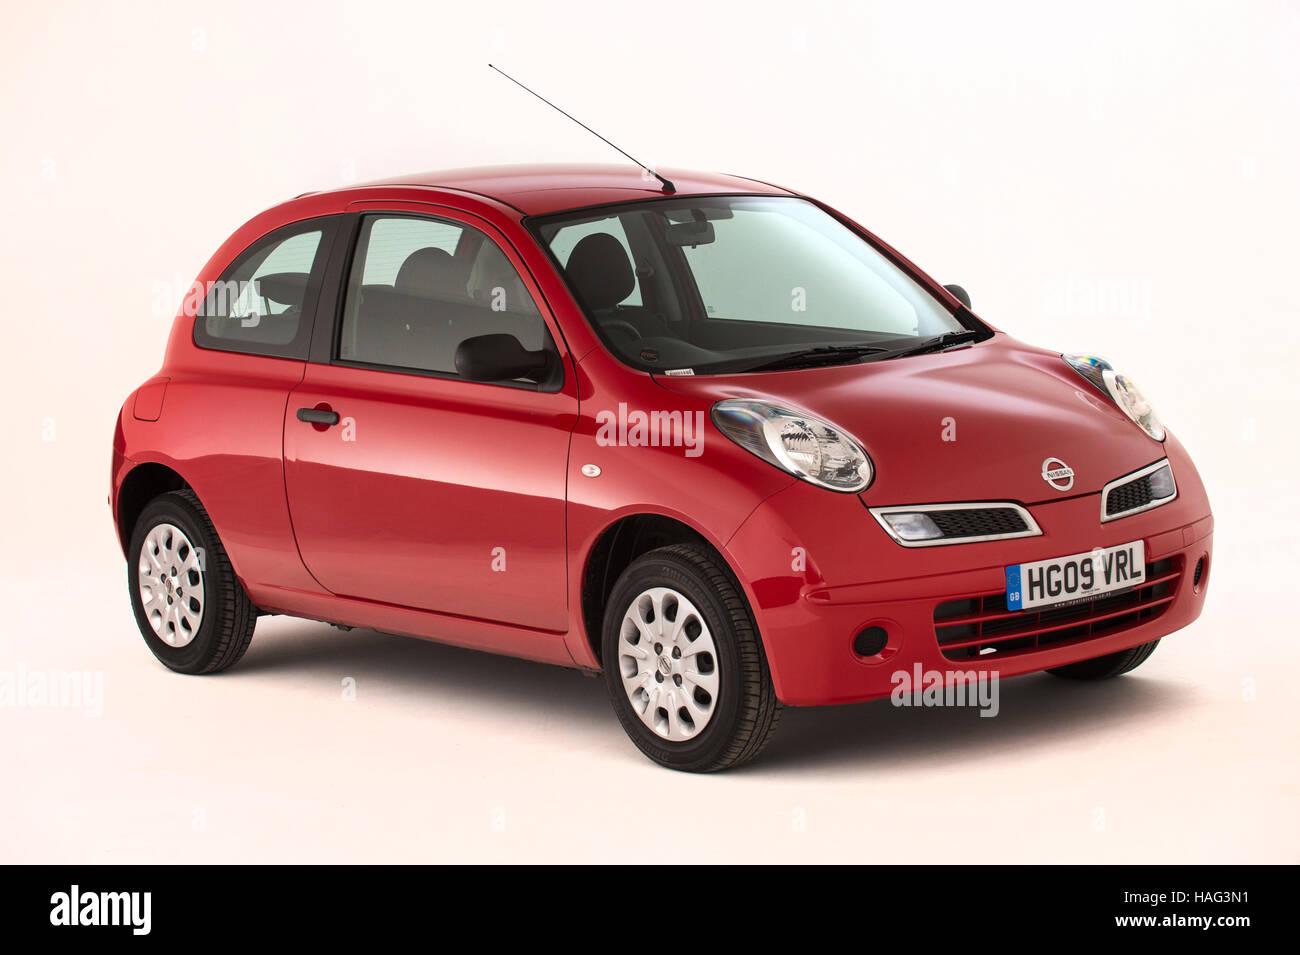 2009 Nissan Micra Stock Photo